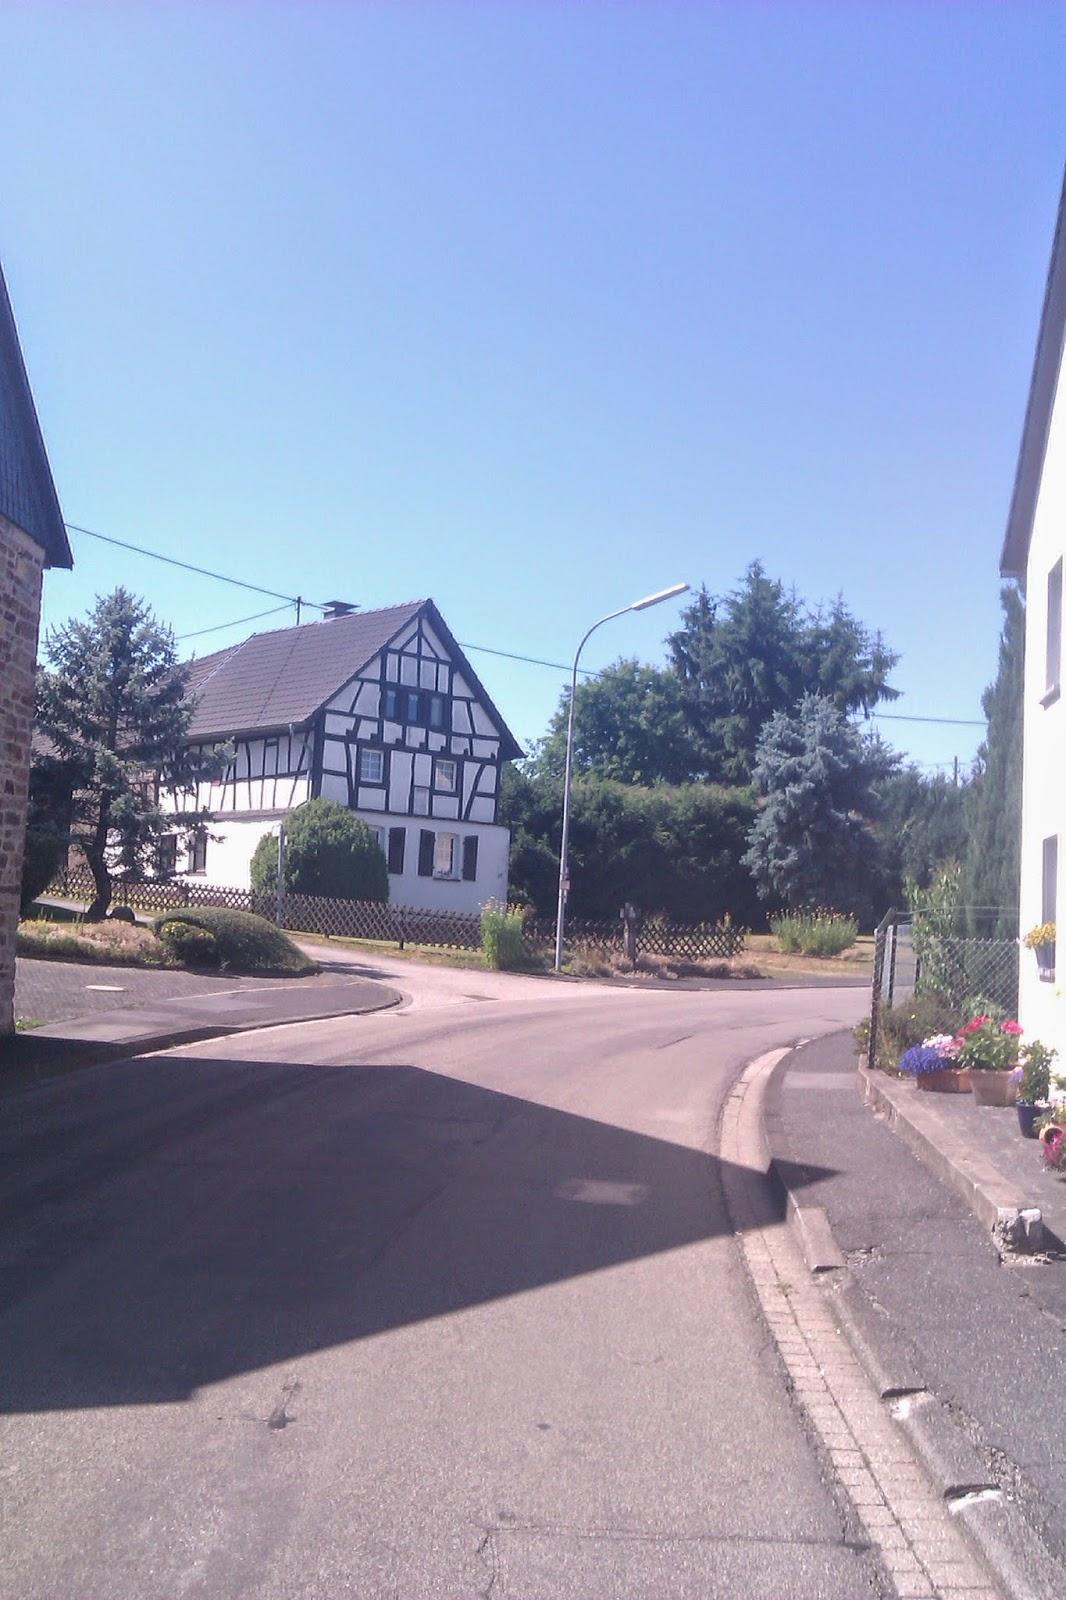 Dottingen Reinlandpfalz